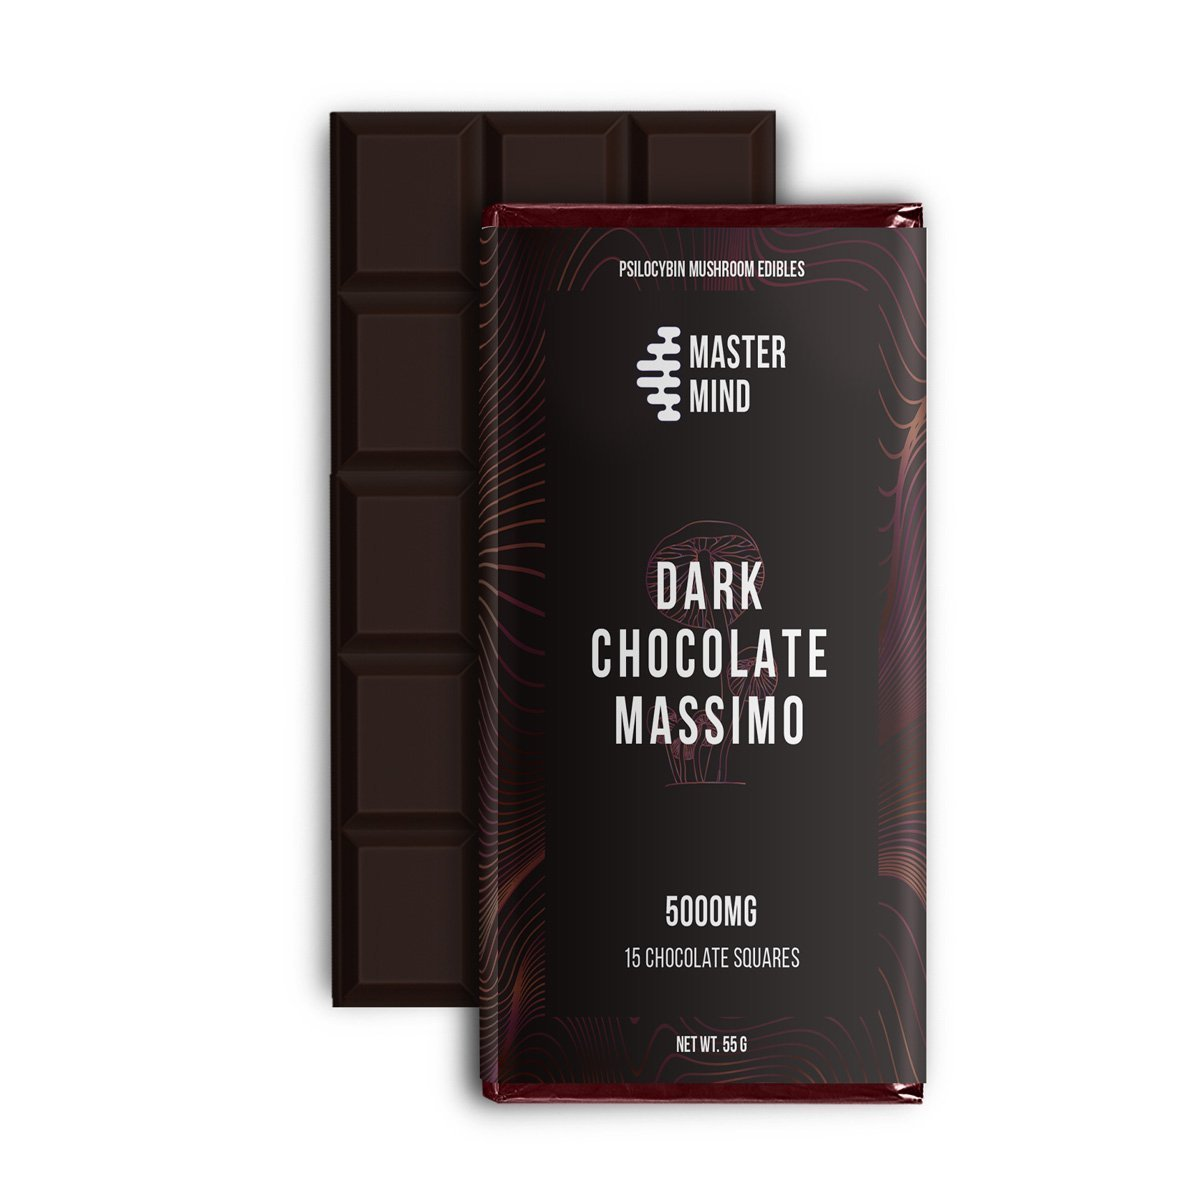 Dark Chocolate Massimo